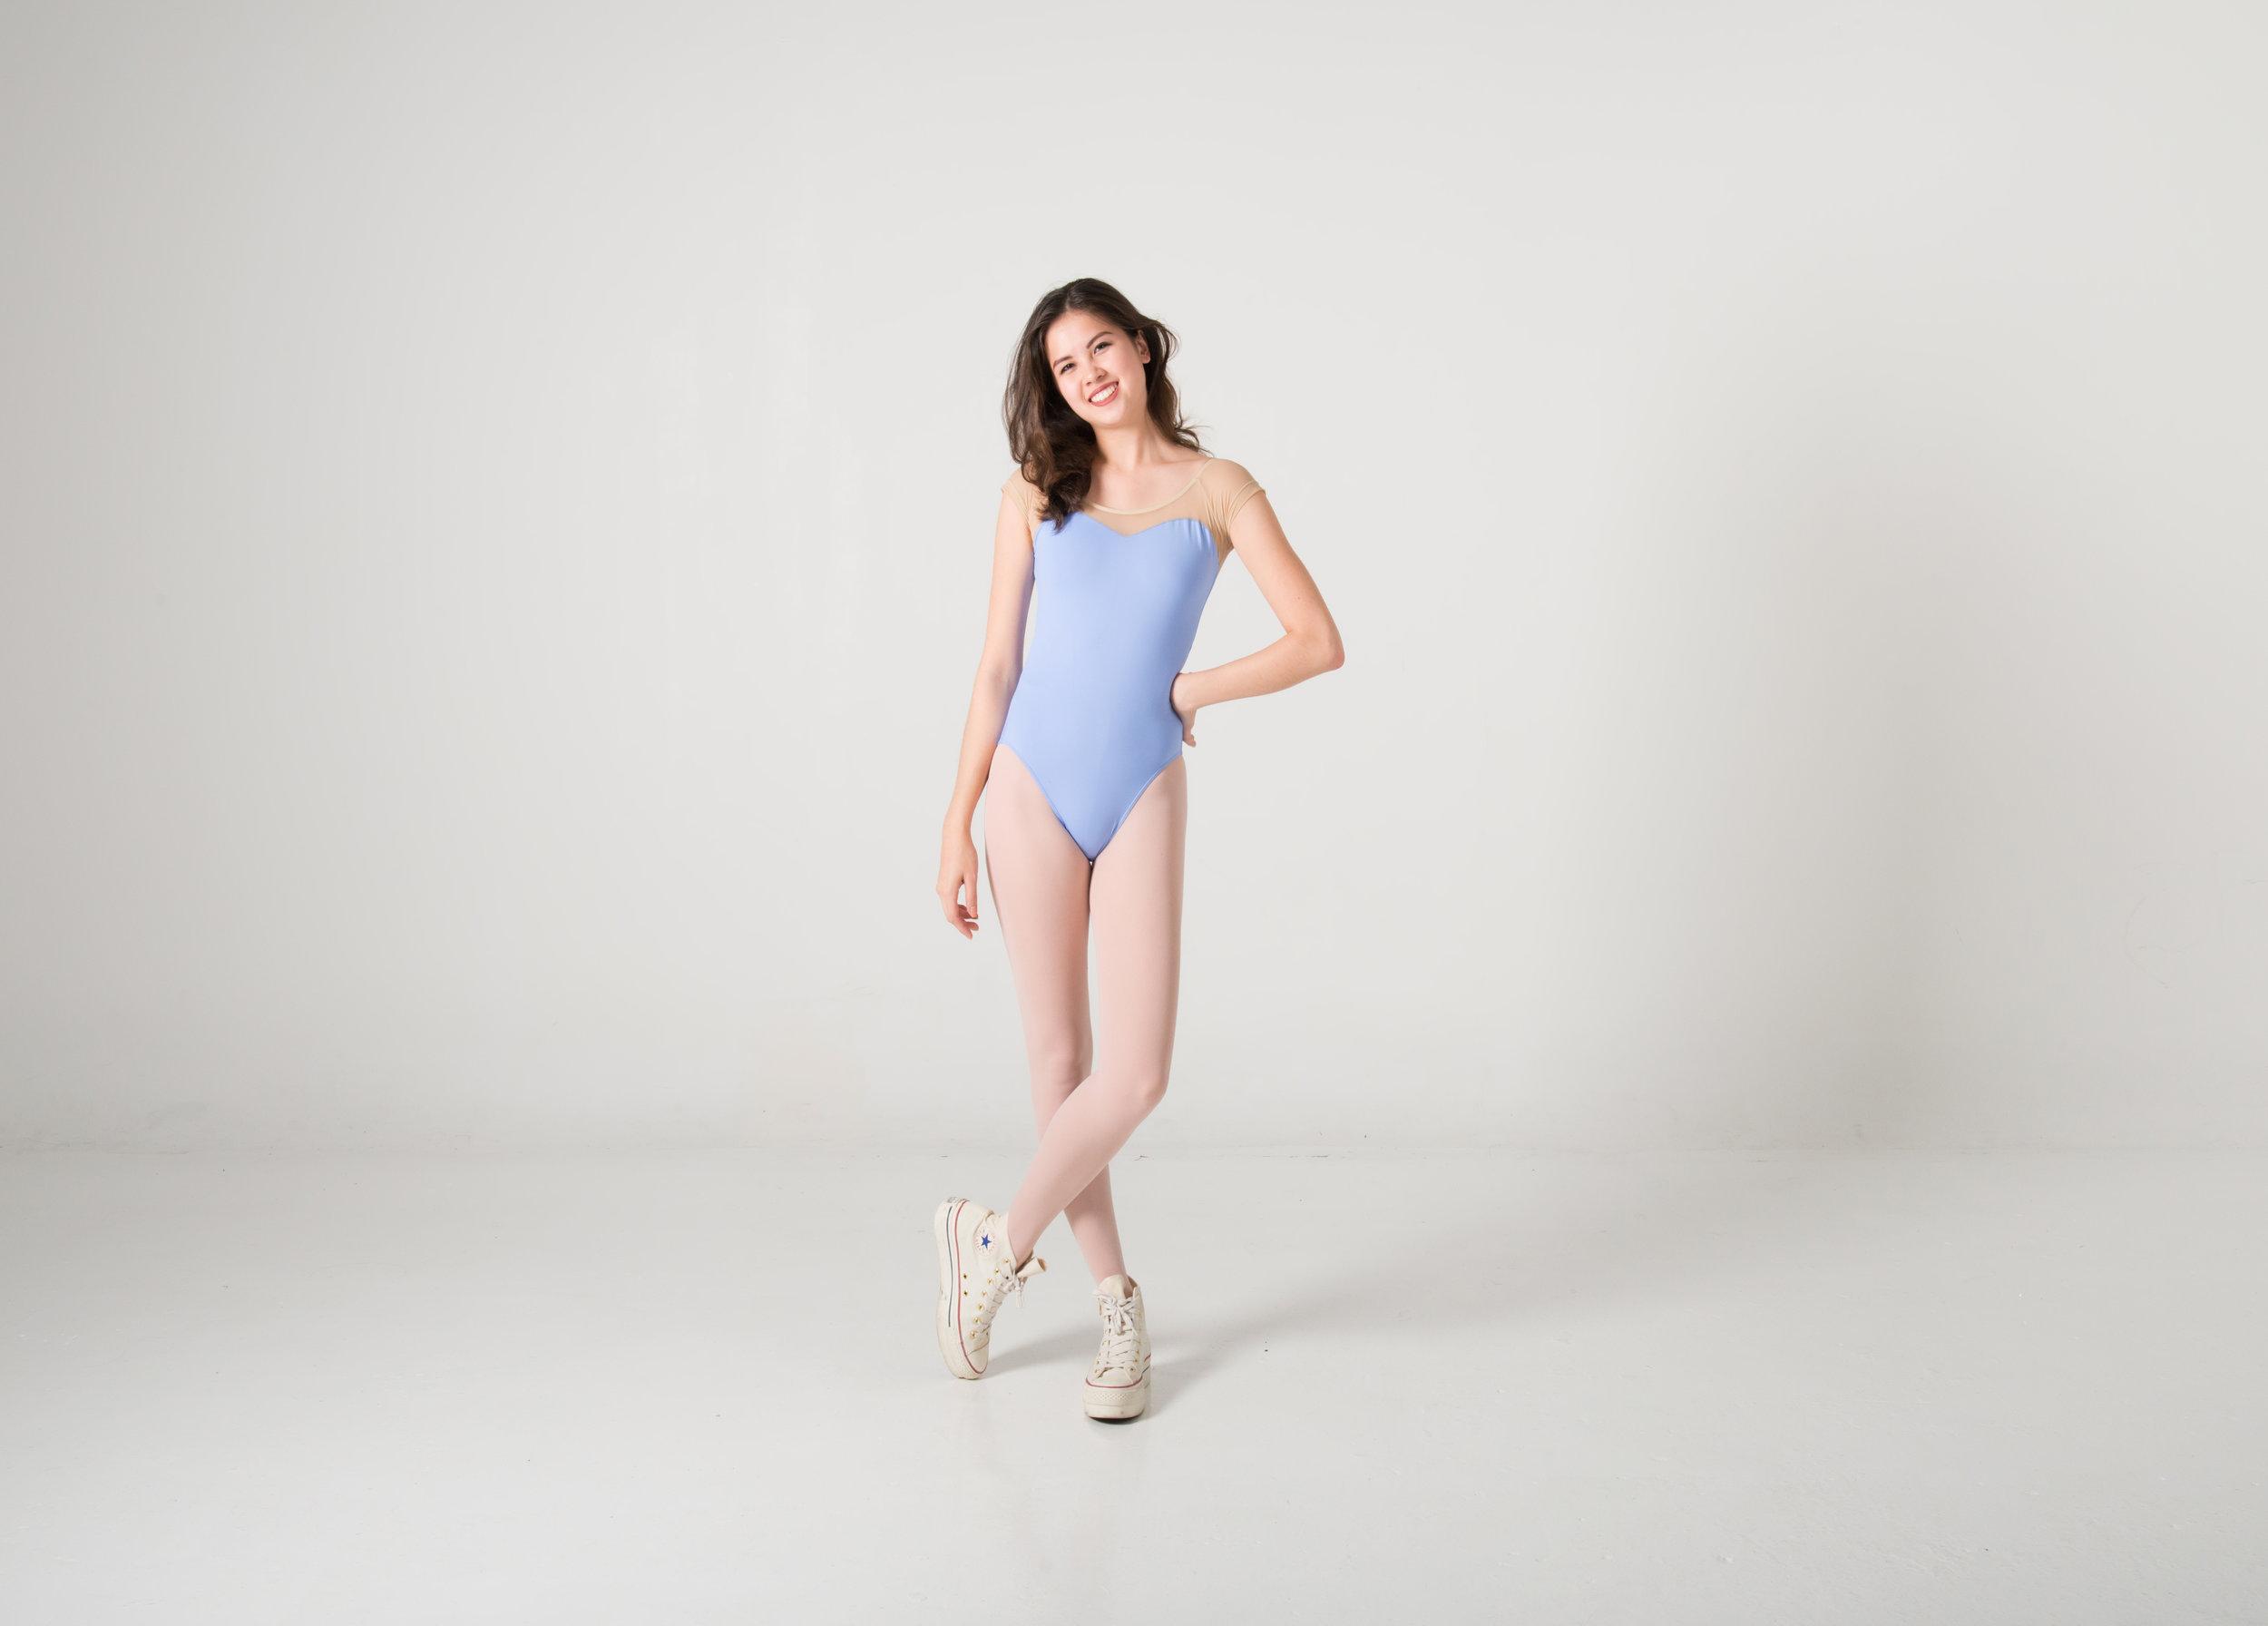 Anna Beeman for Balletlove.co